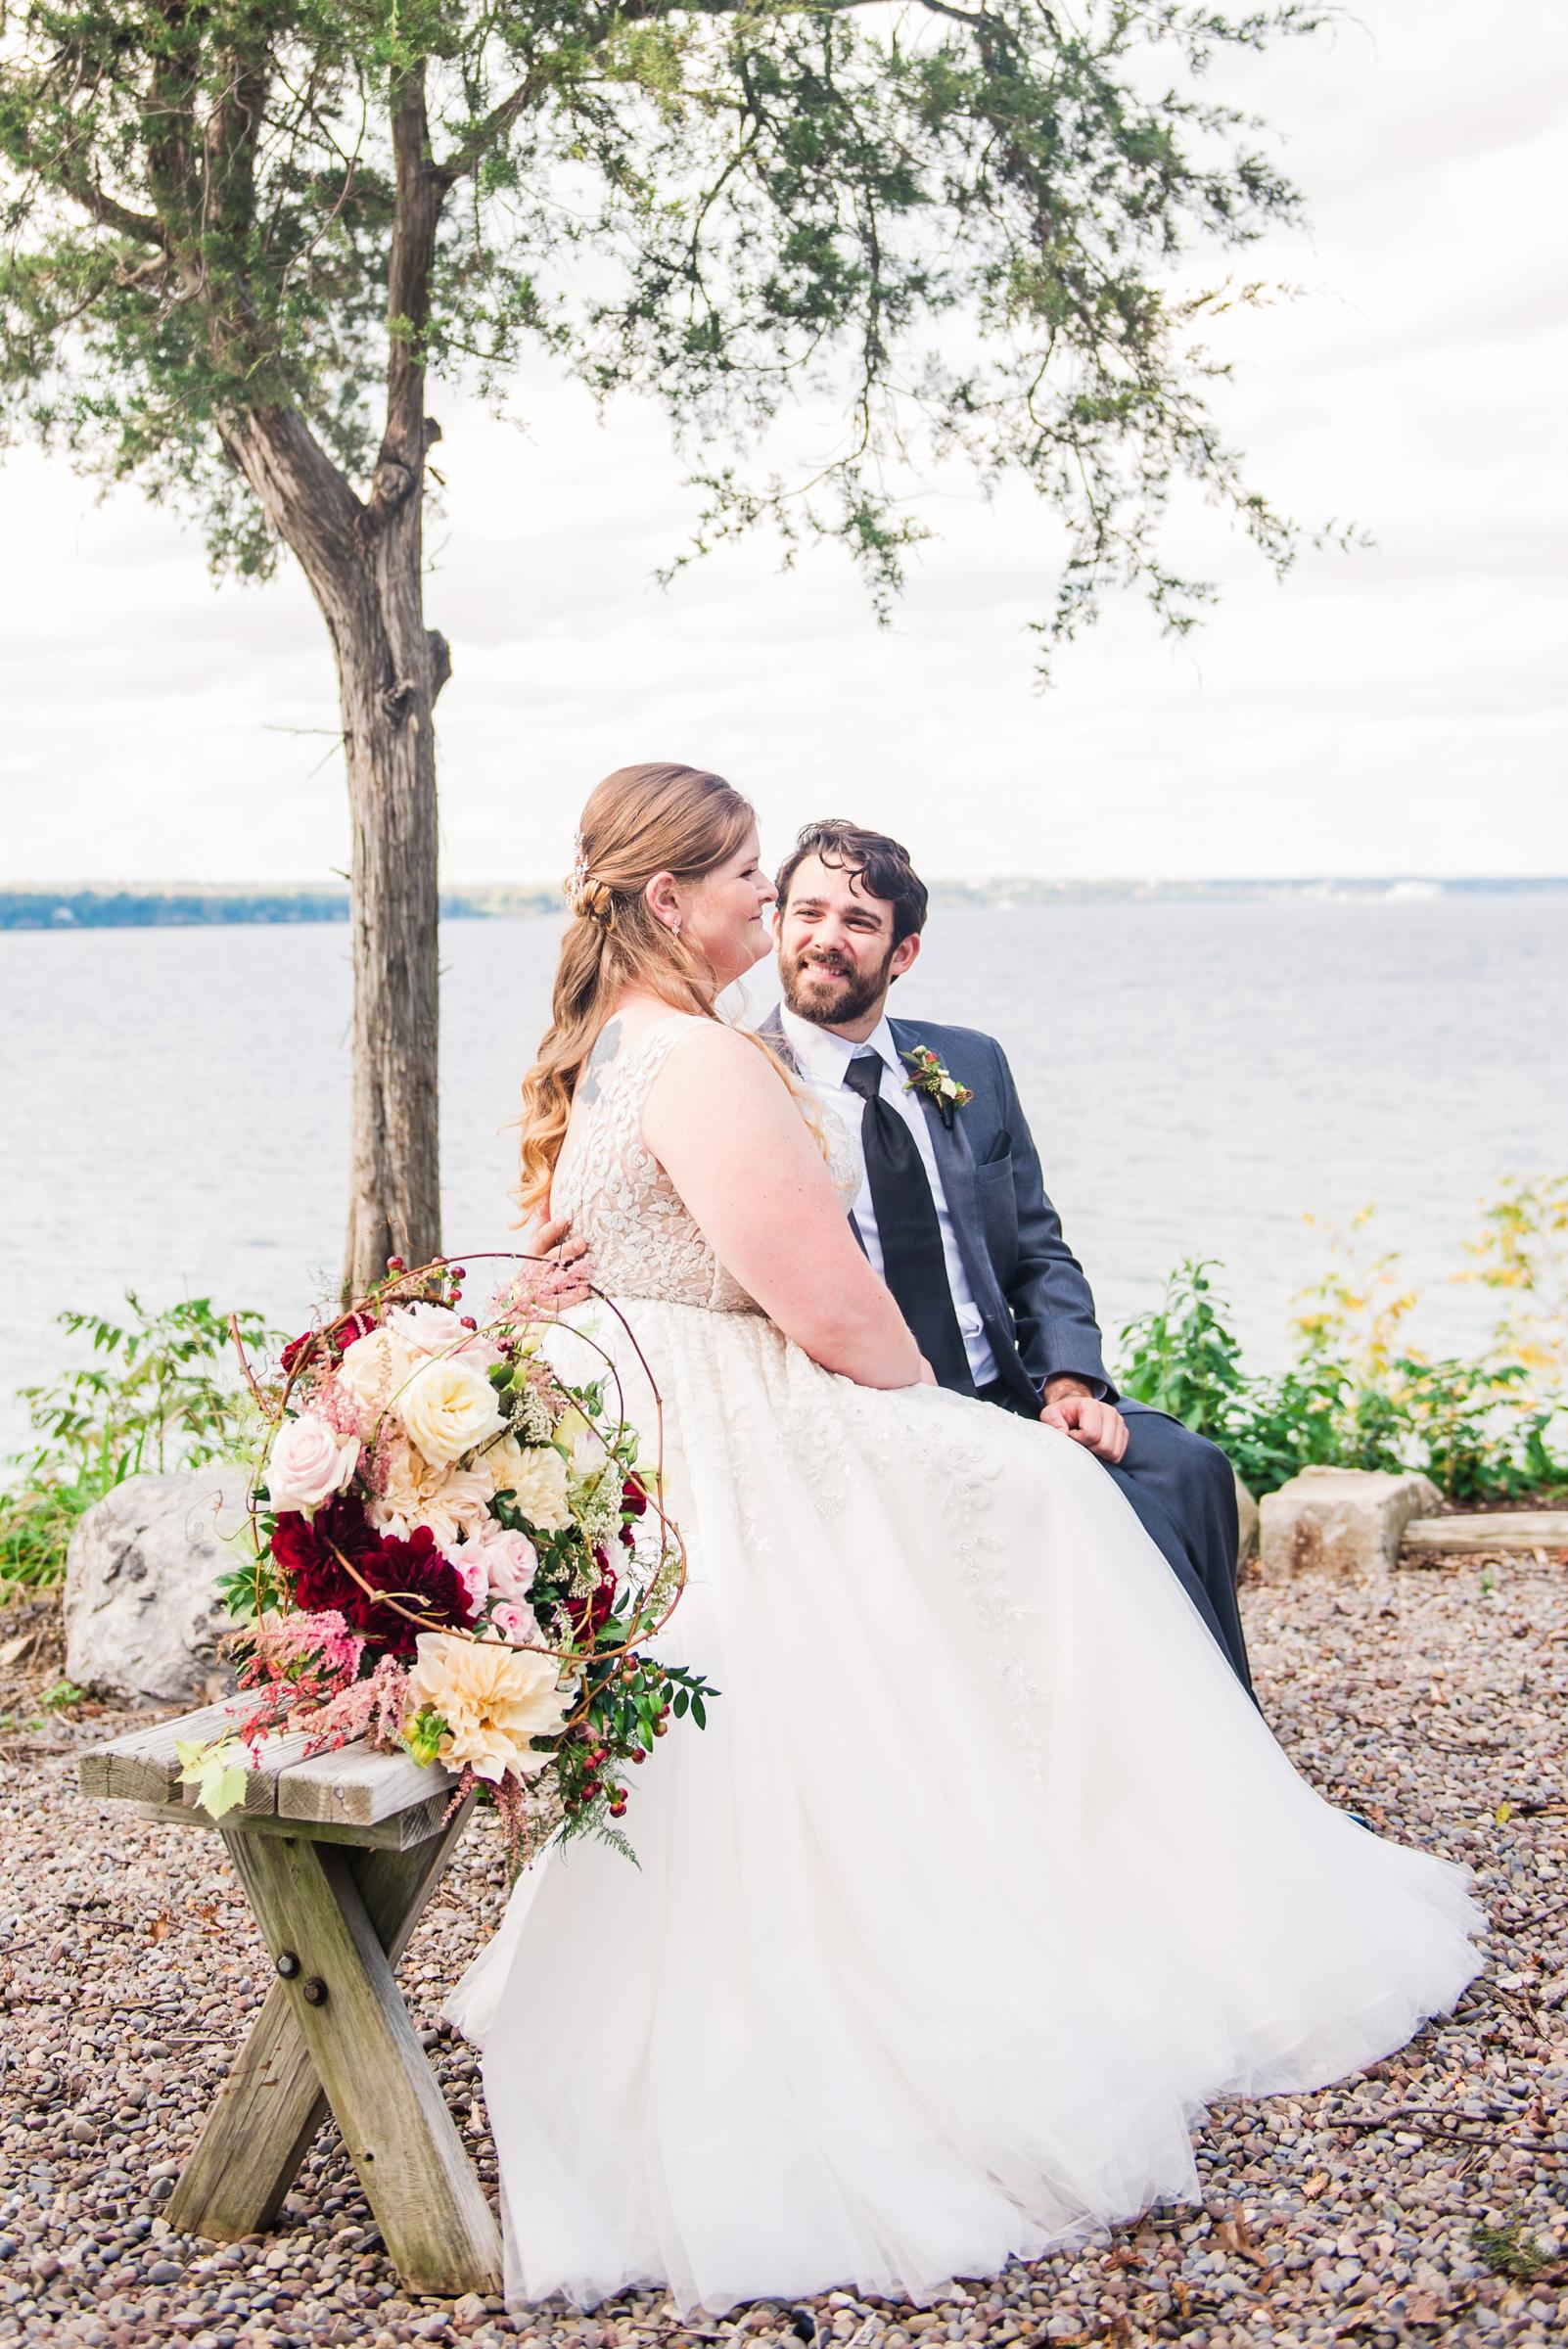 Zugibe_Vineyards_Finger_Lakes_Wedding_JILL_STUDIO_Rochester_NY_Photographer_DSC_3520.jpg